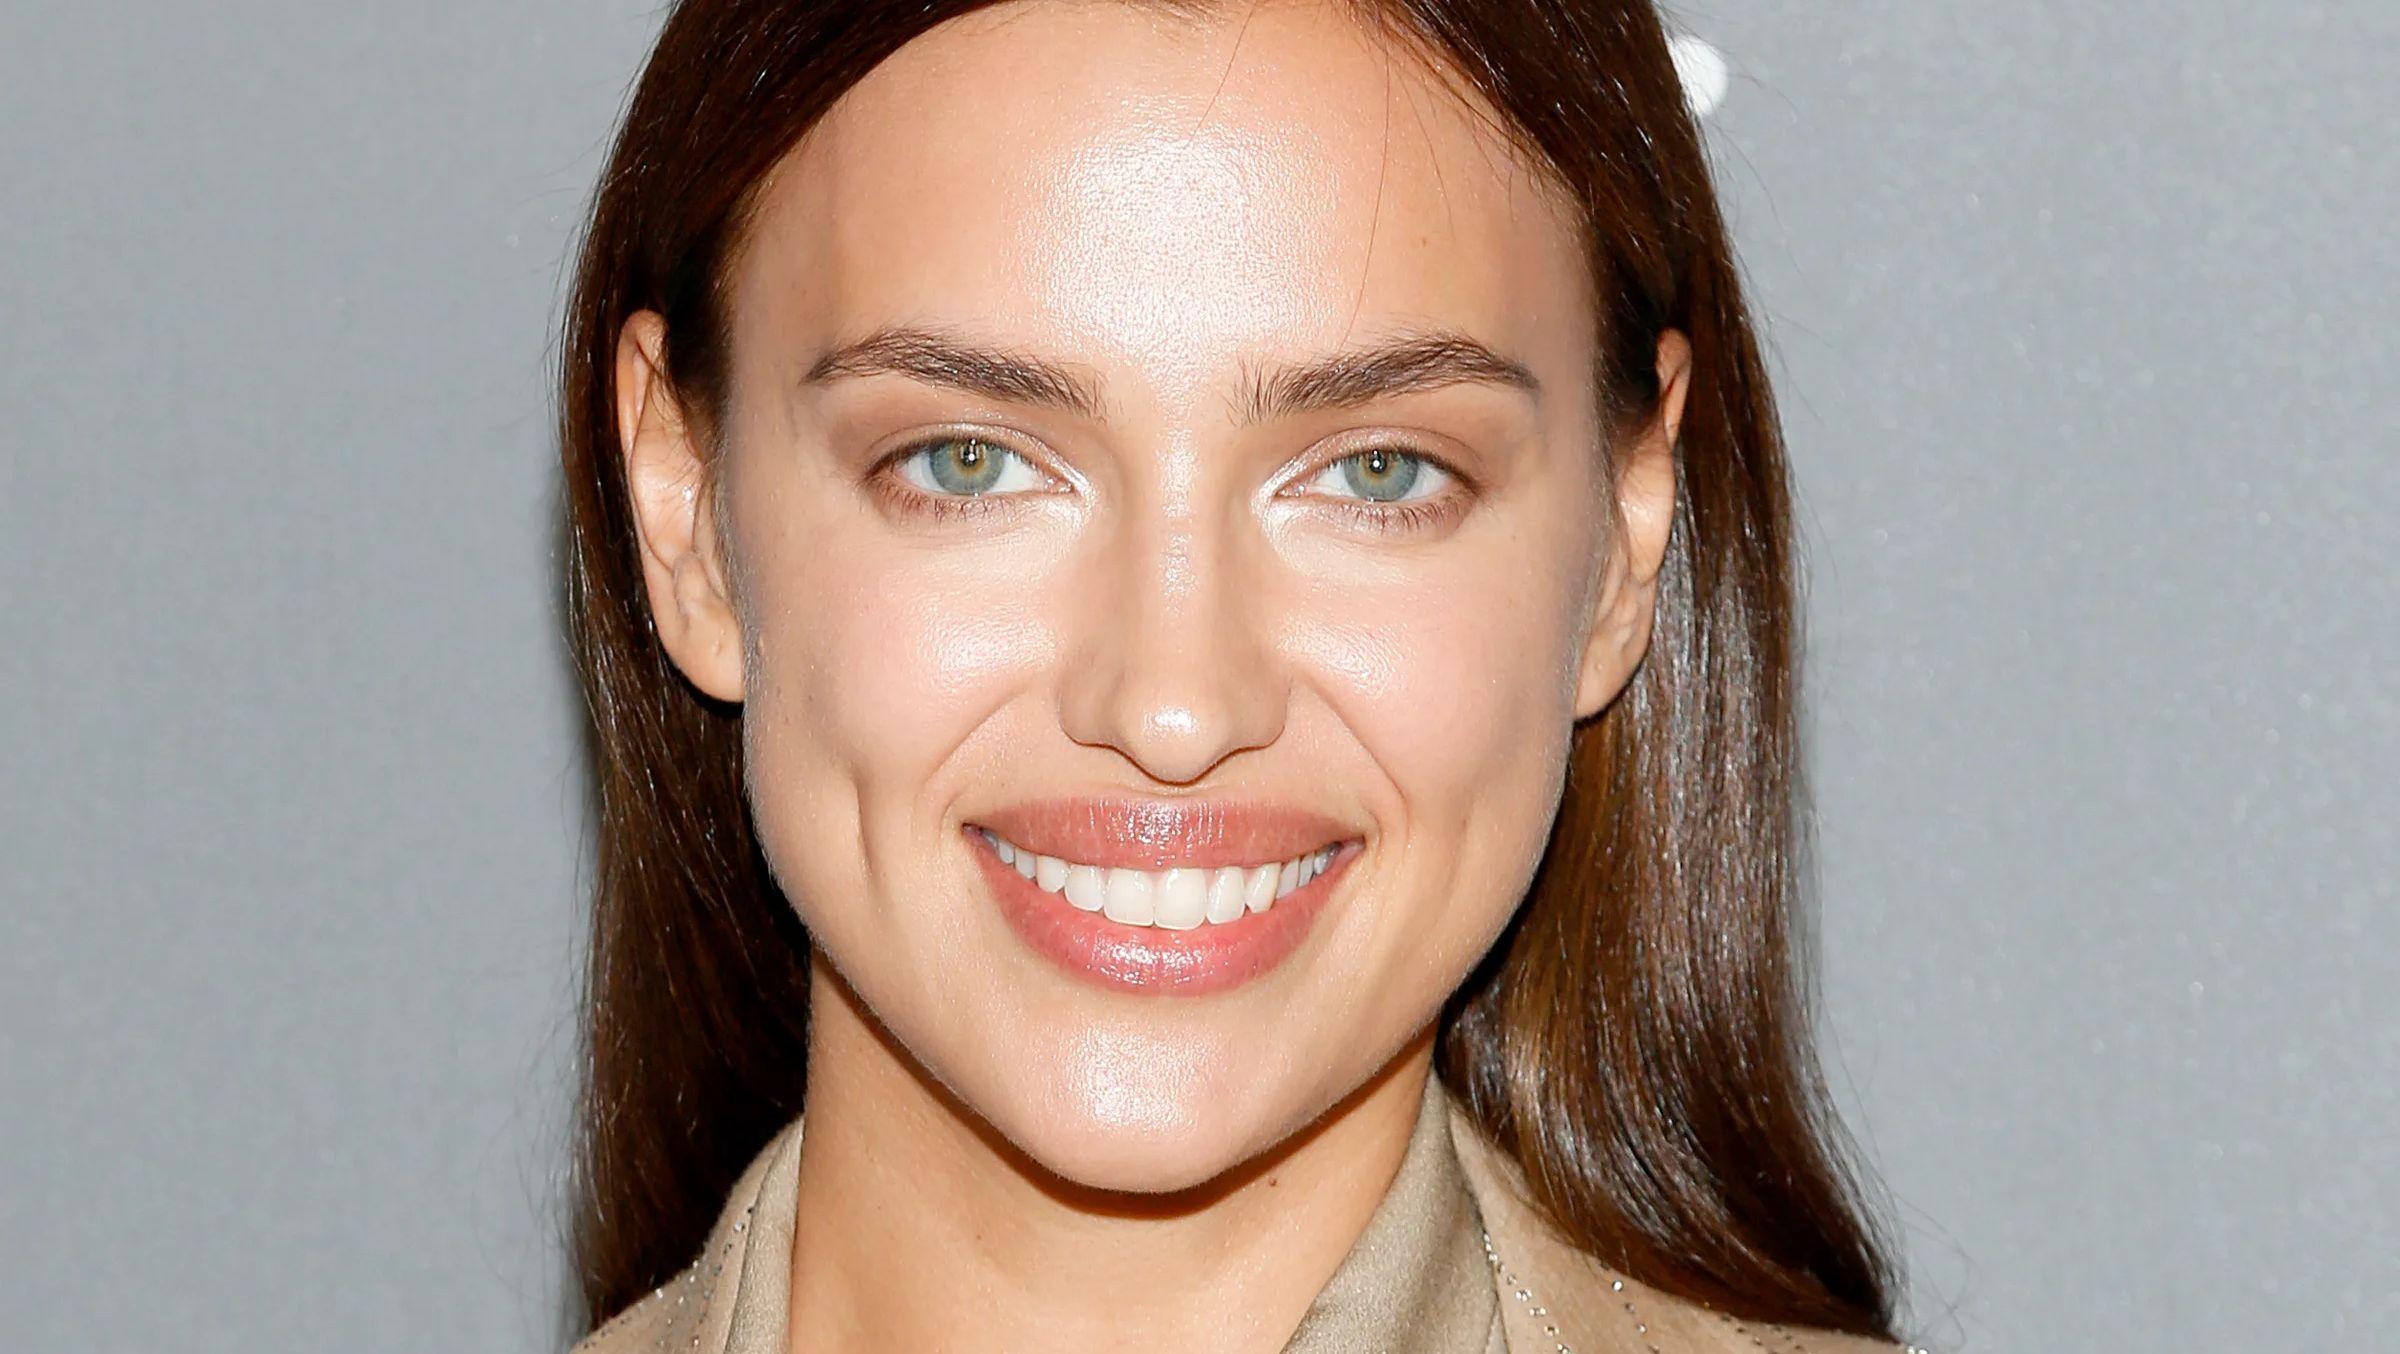 Irina Shayk smiles close up